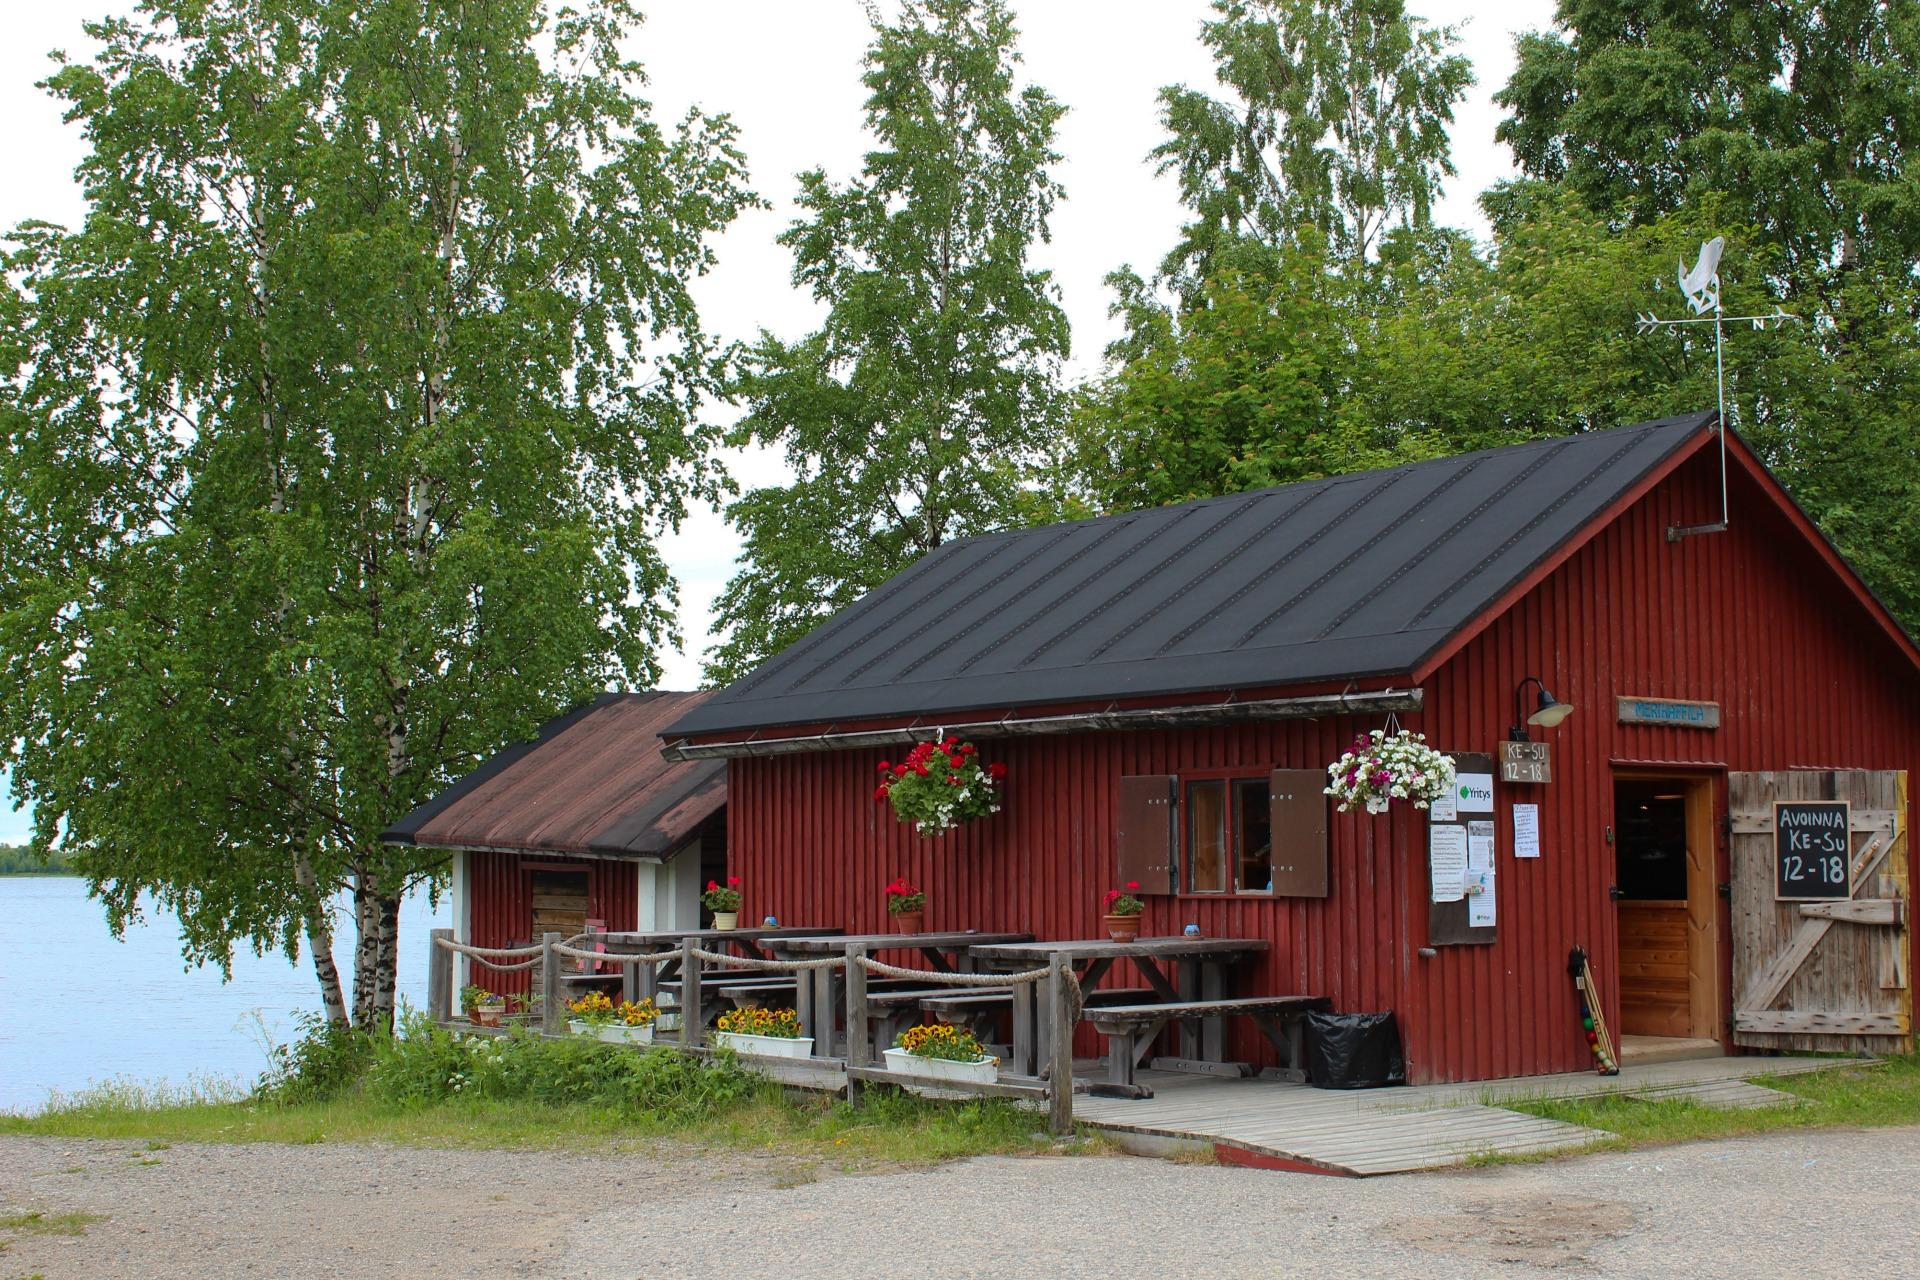 Merikahvilan pihapiiri Vasankarin uimarannalla.